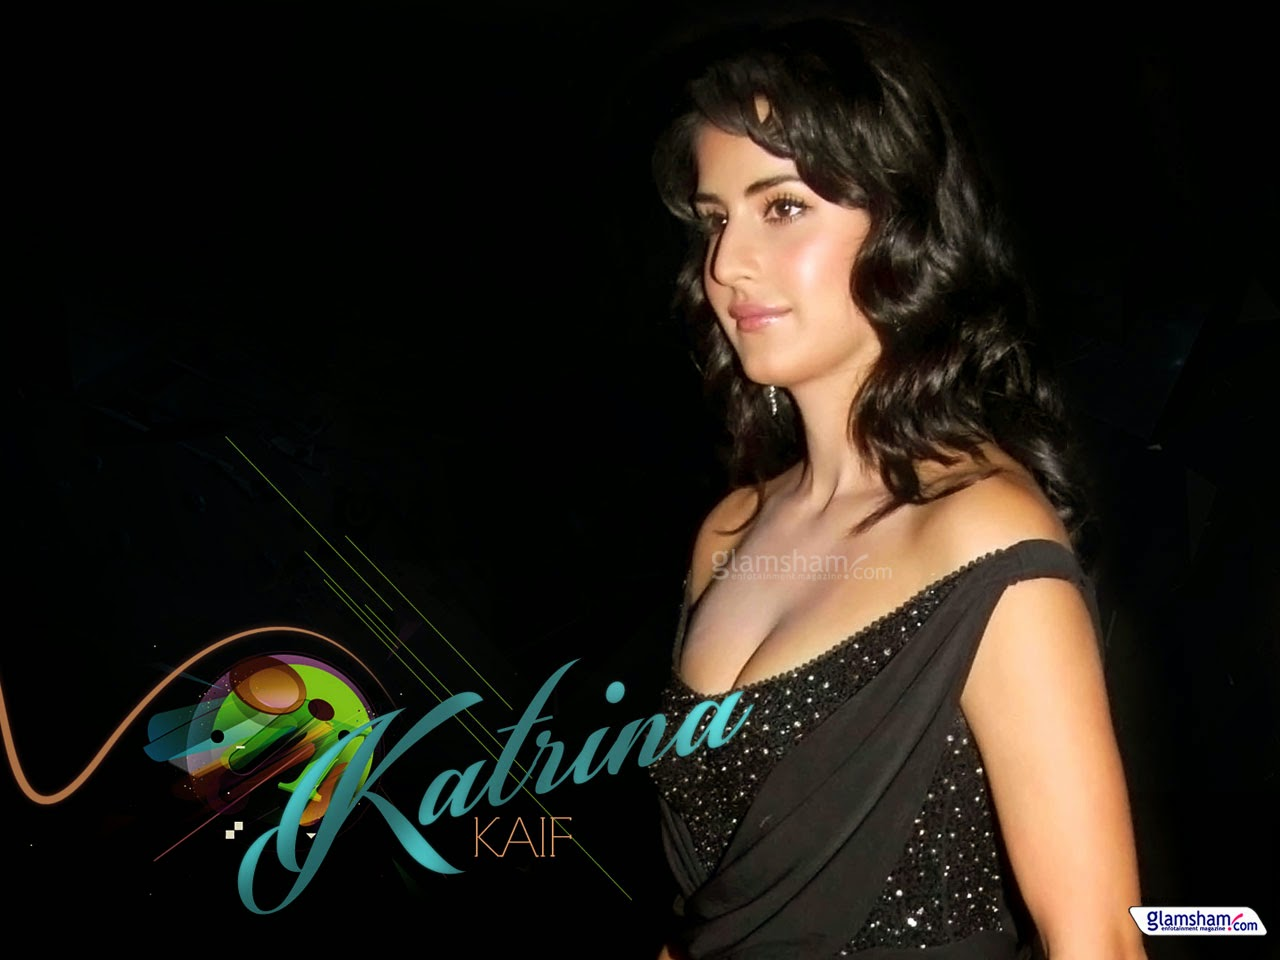 katrina kaif wallpaper 255 - photo #5